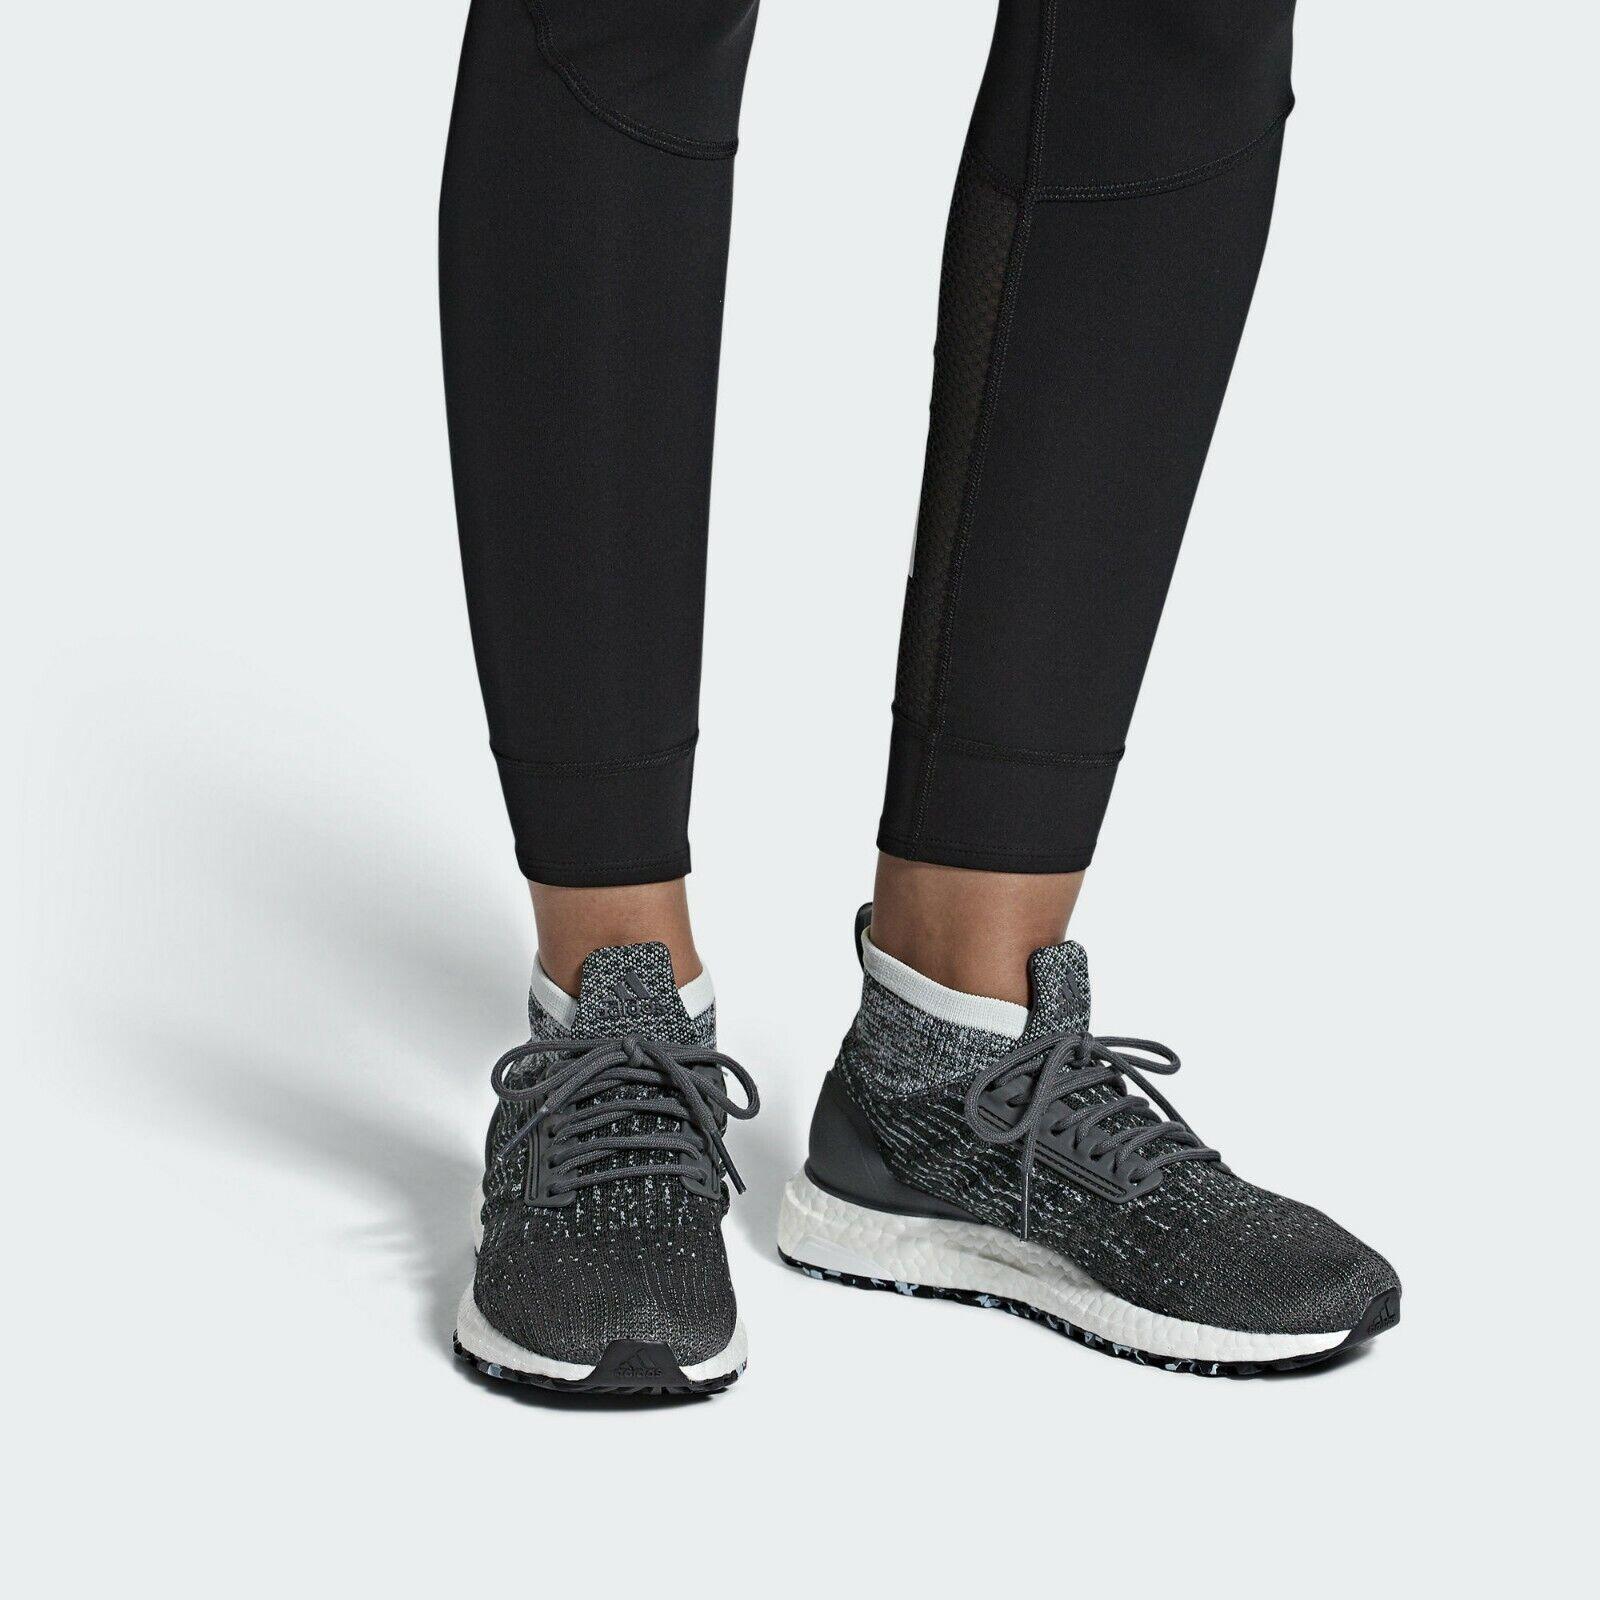 Adidas UltraBoock All Terrain F36129 Wouomo Running scarpe.100%  AUTHENTIC  disegni esclusivi